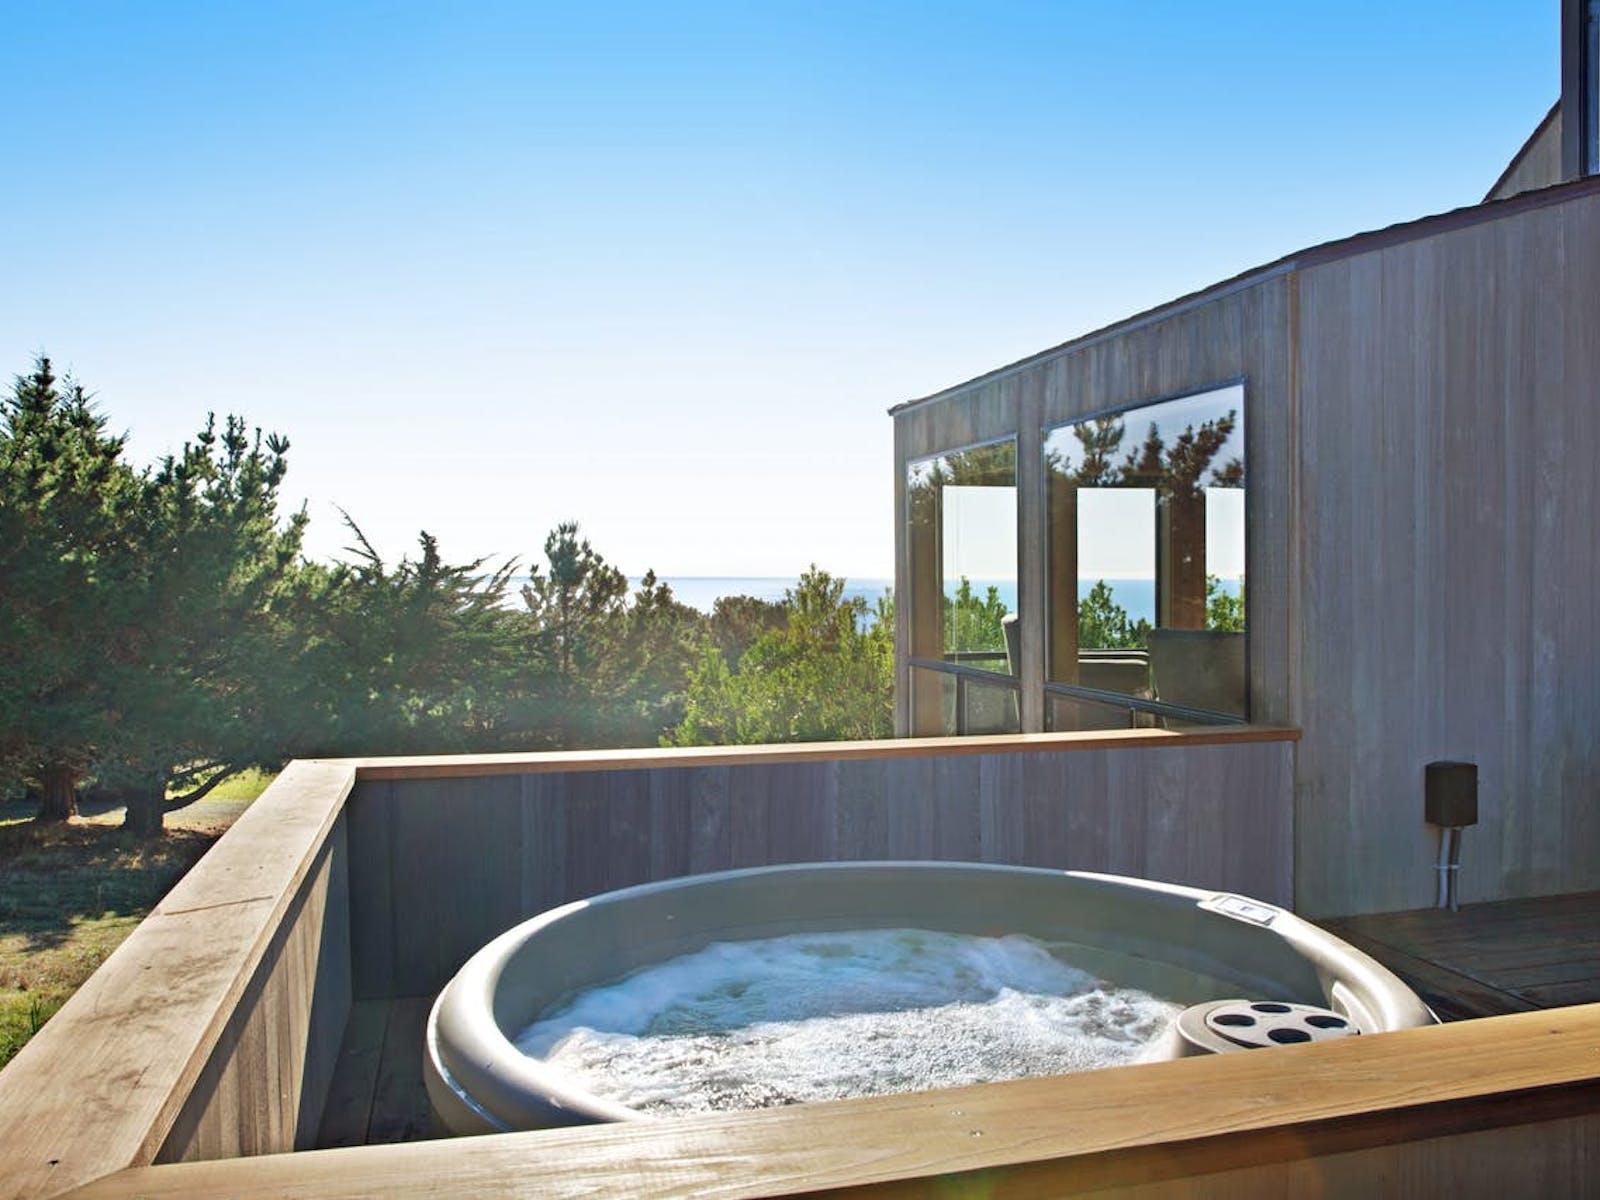 outdoor hot tub with coastal view in Sea Ranch, CA